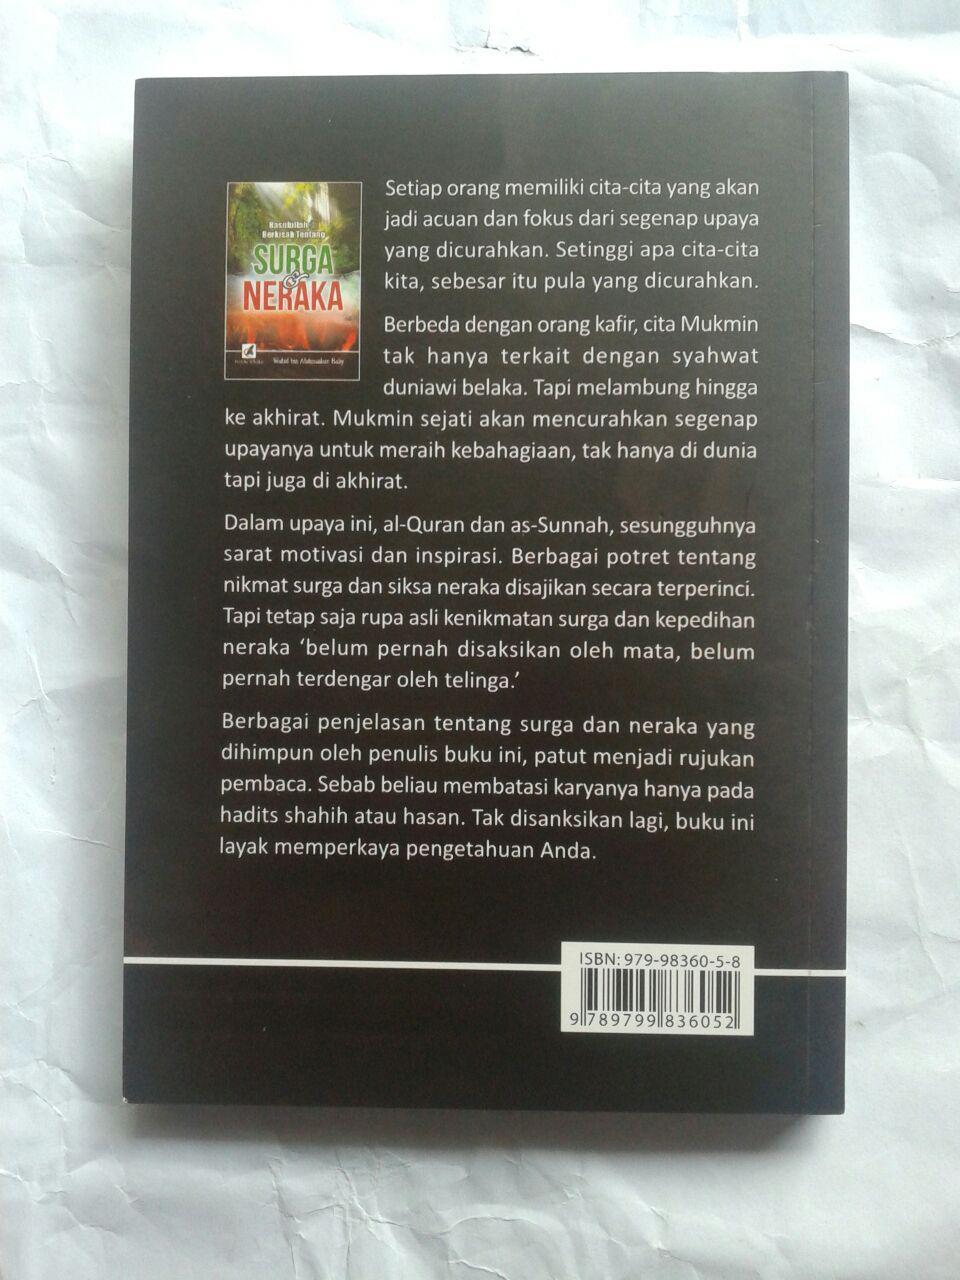 Buku Rasulullah Berkisah Tentang Surga & Neraka 25,000 15% 21,250 cover